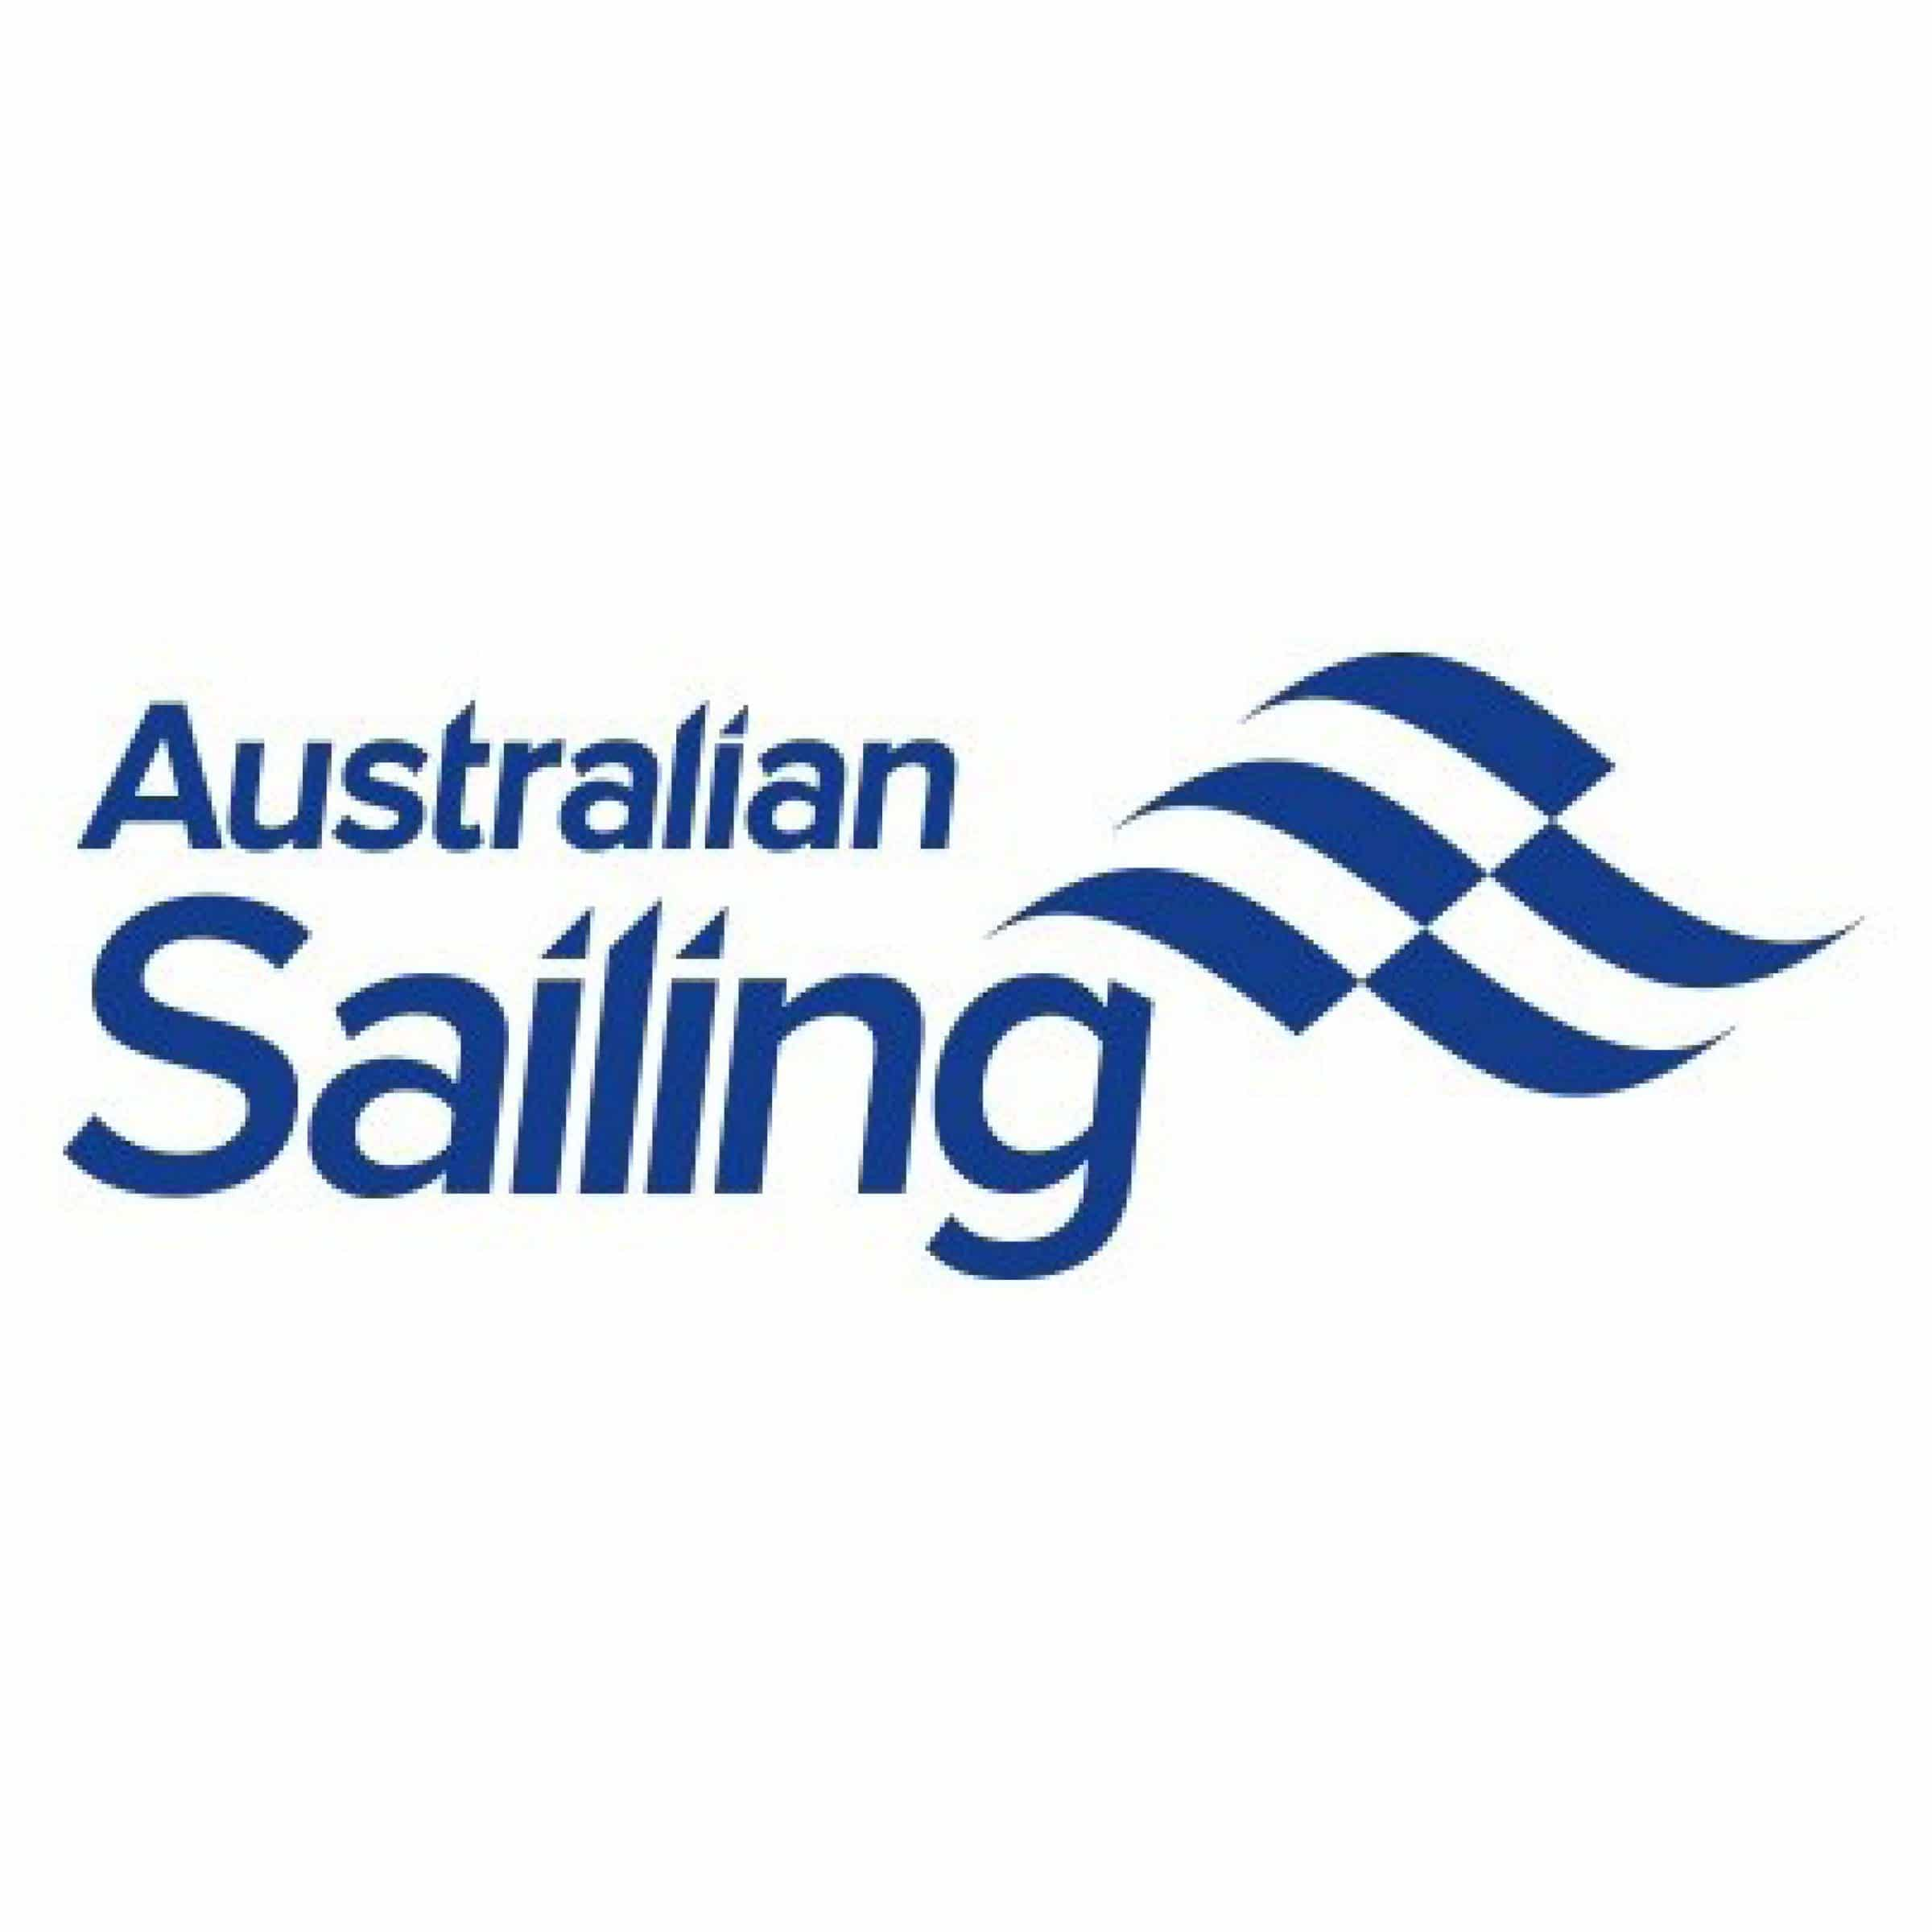 swan river sailing supporter australian sailing logo